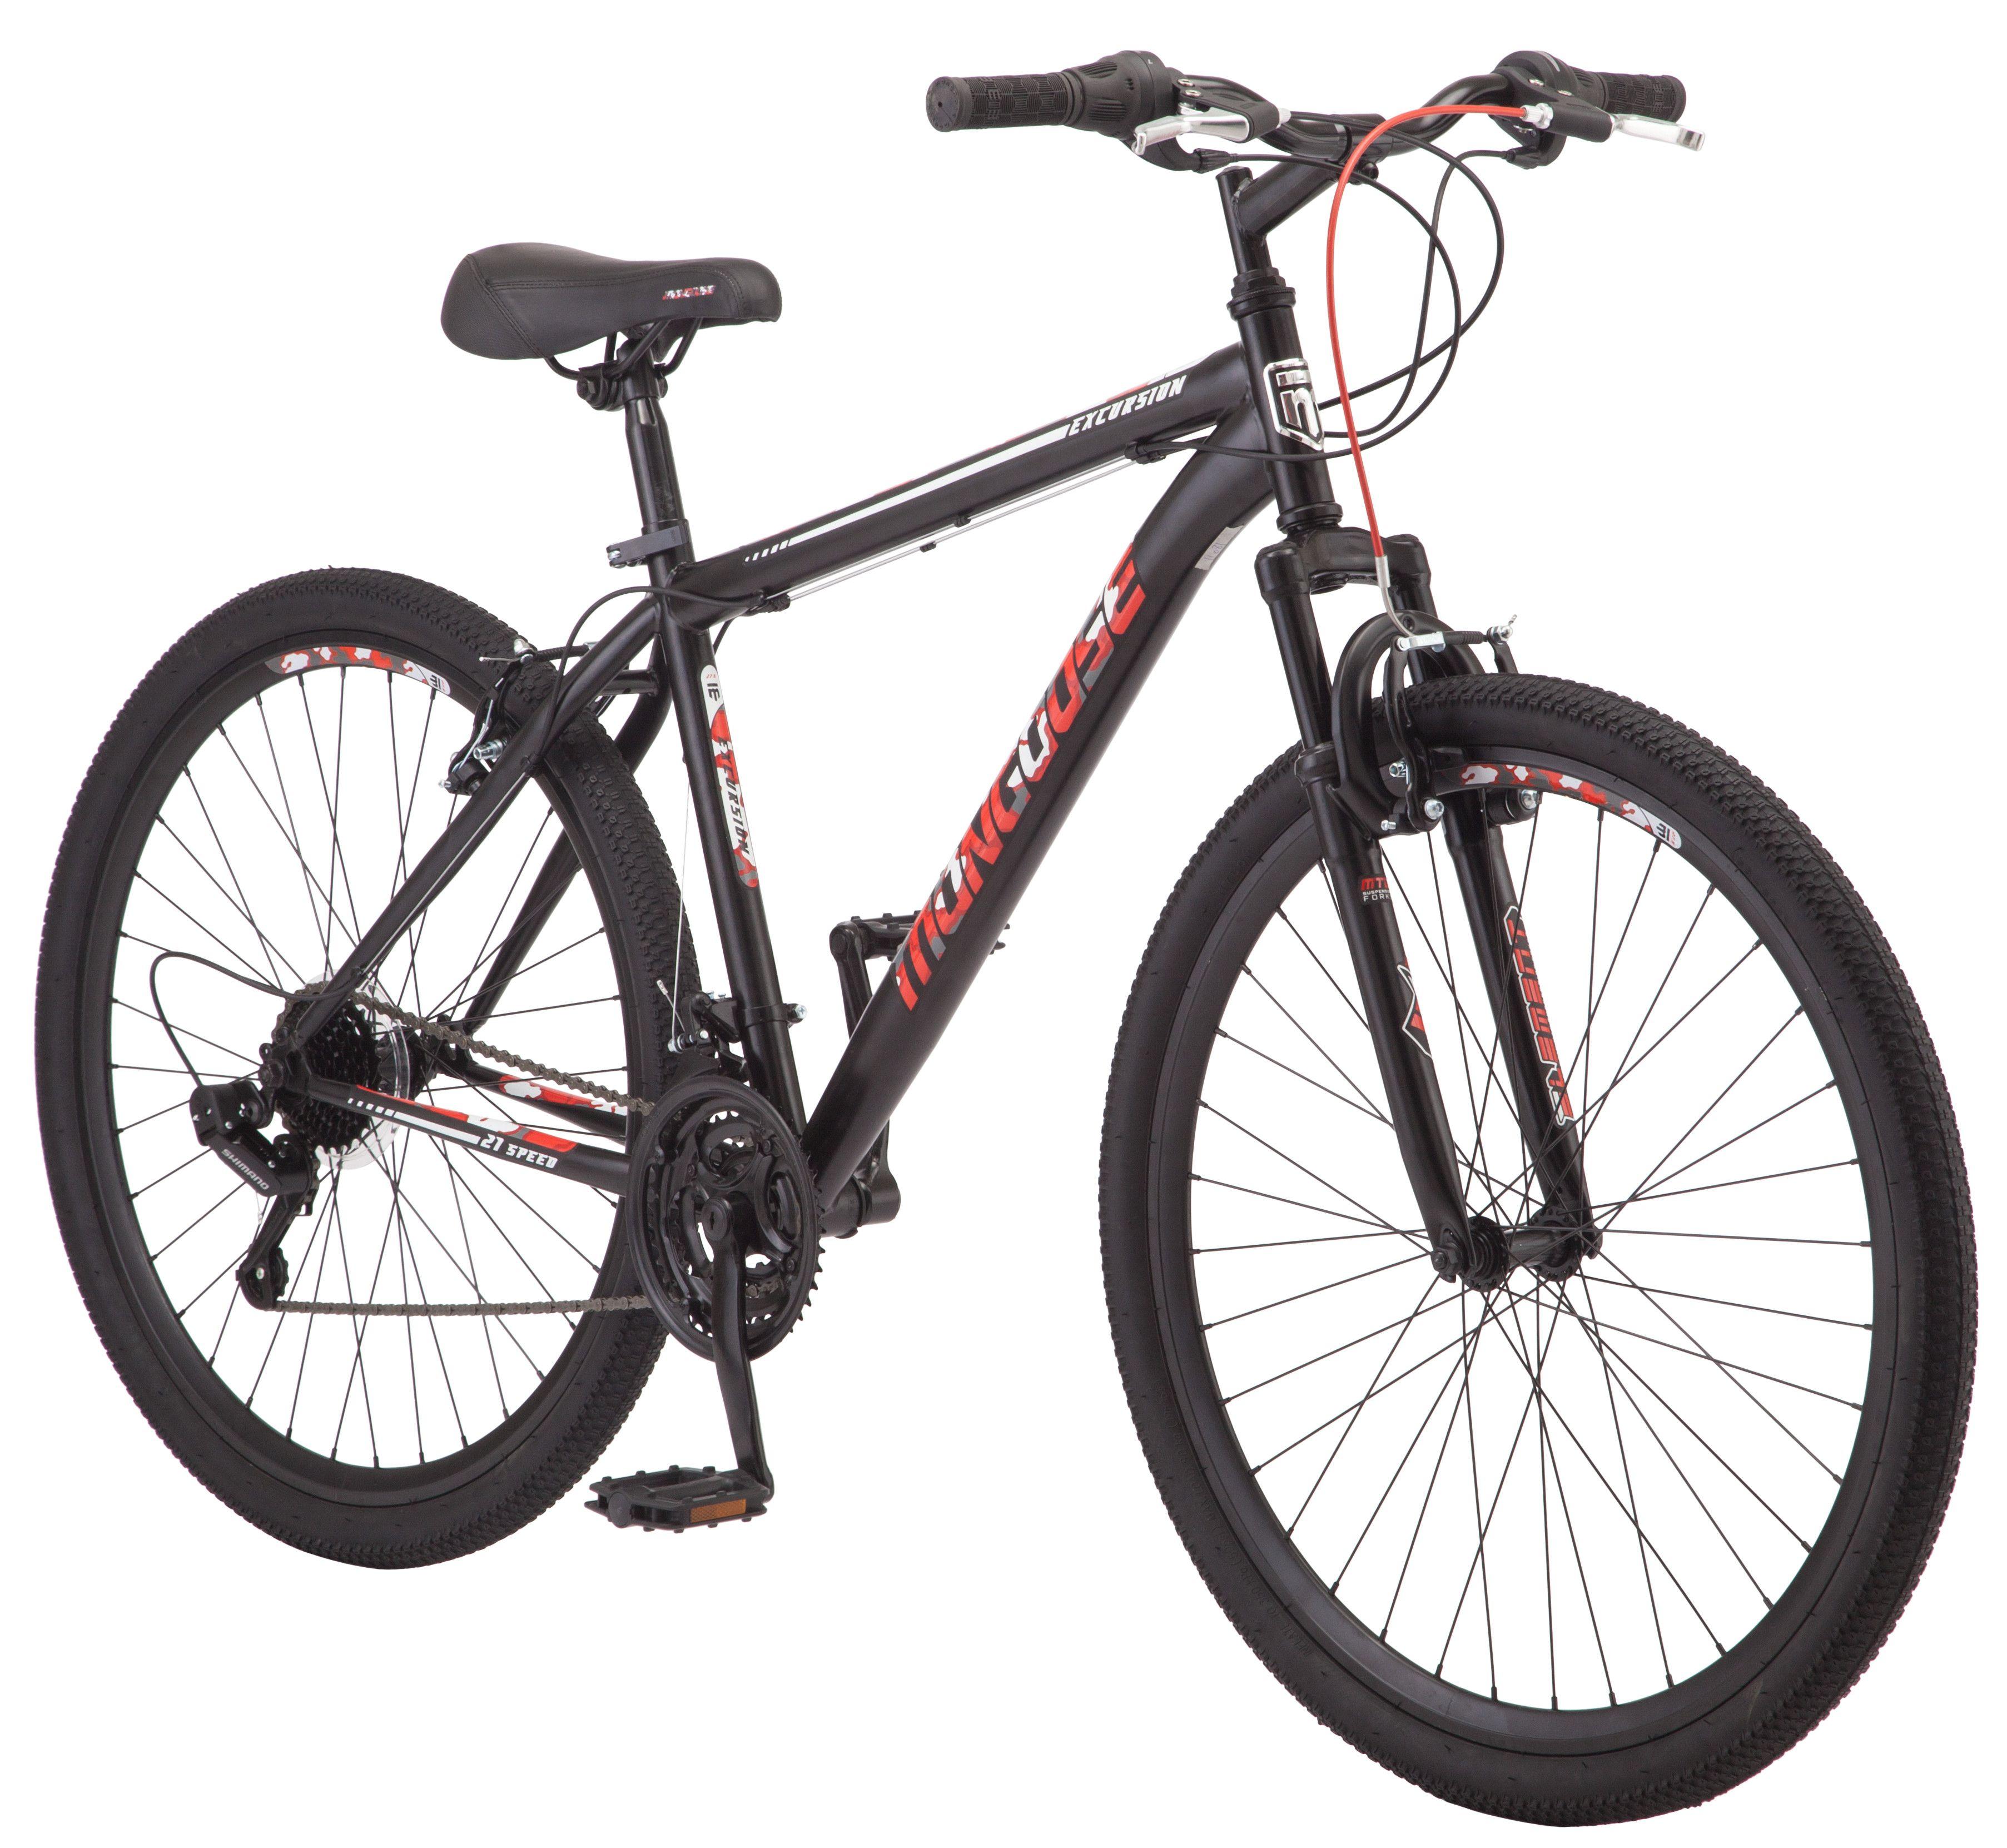 Mongoose Excursion Mountain Bike Men S 27 5 Black Red Walmart Com Mens Mountain Bike Hardtail Mountain Bike Bicycle